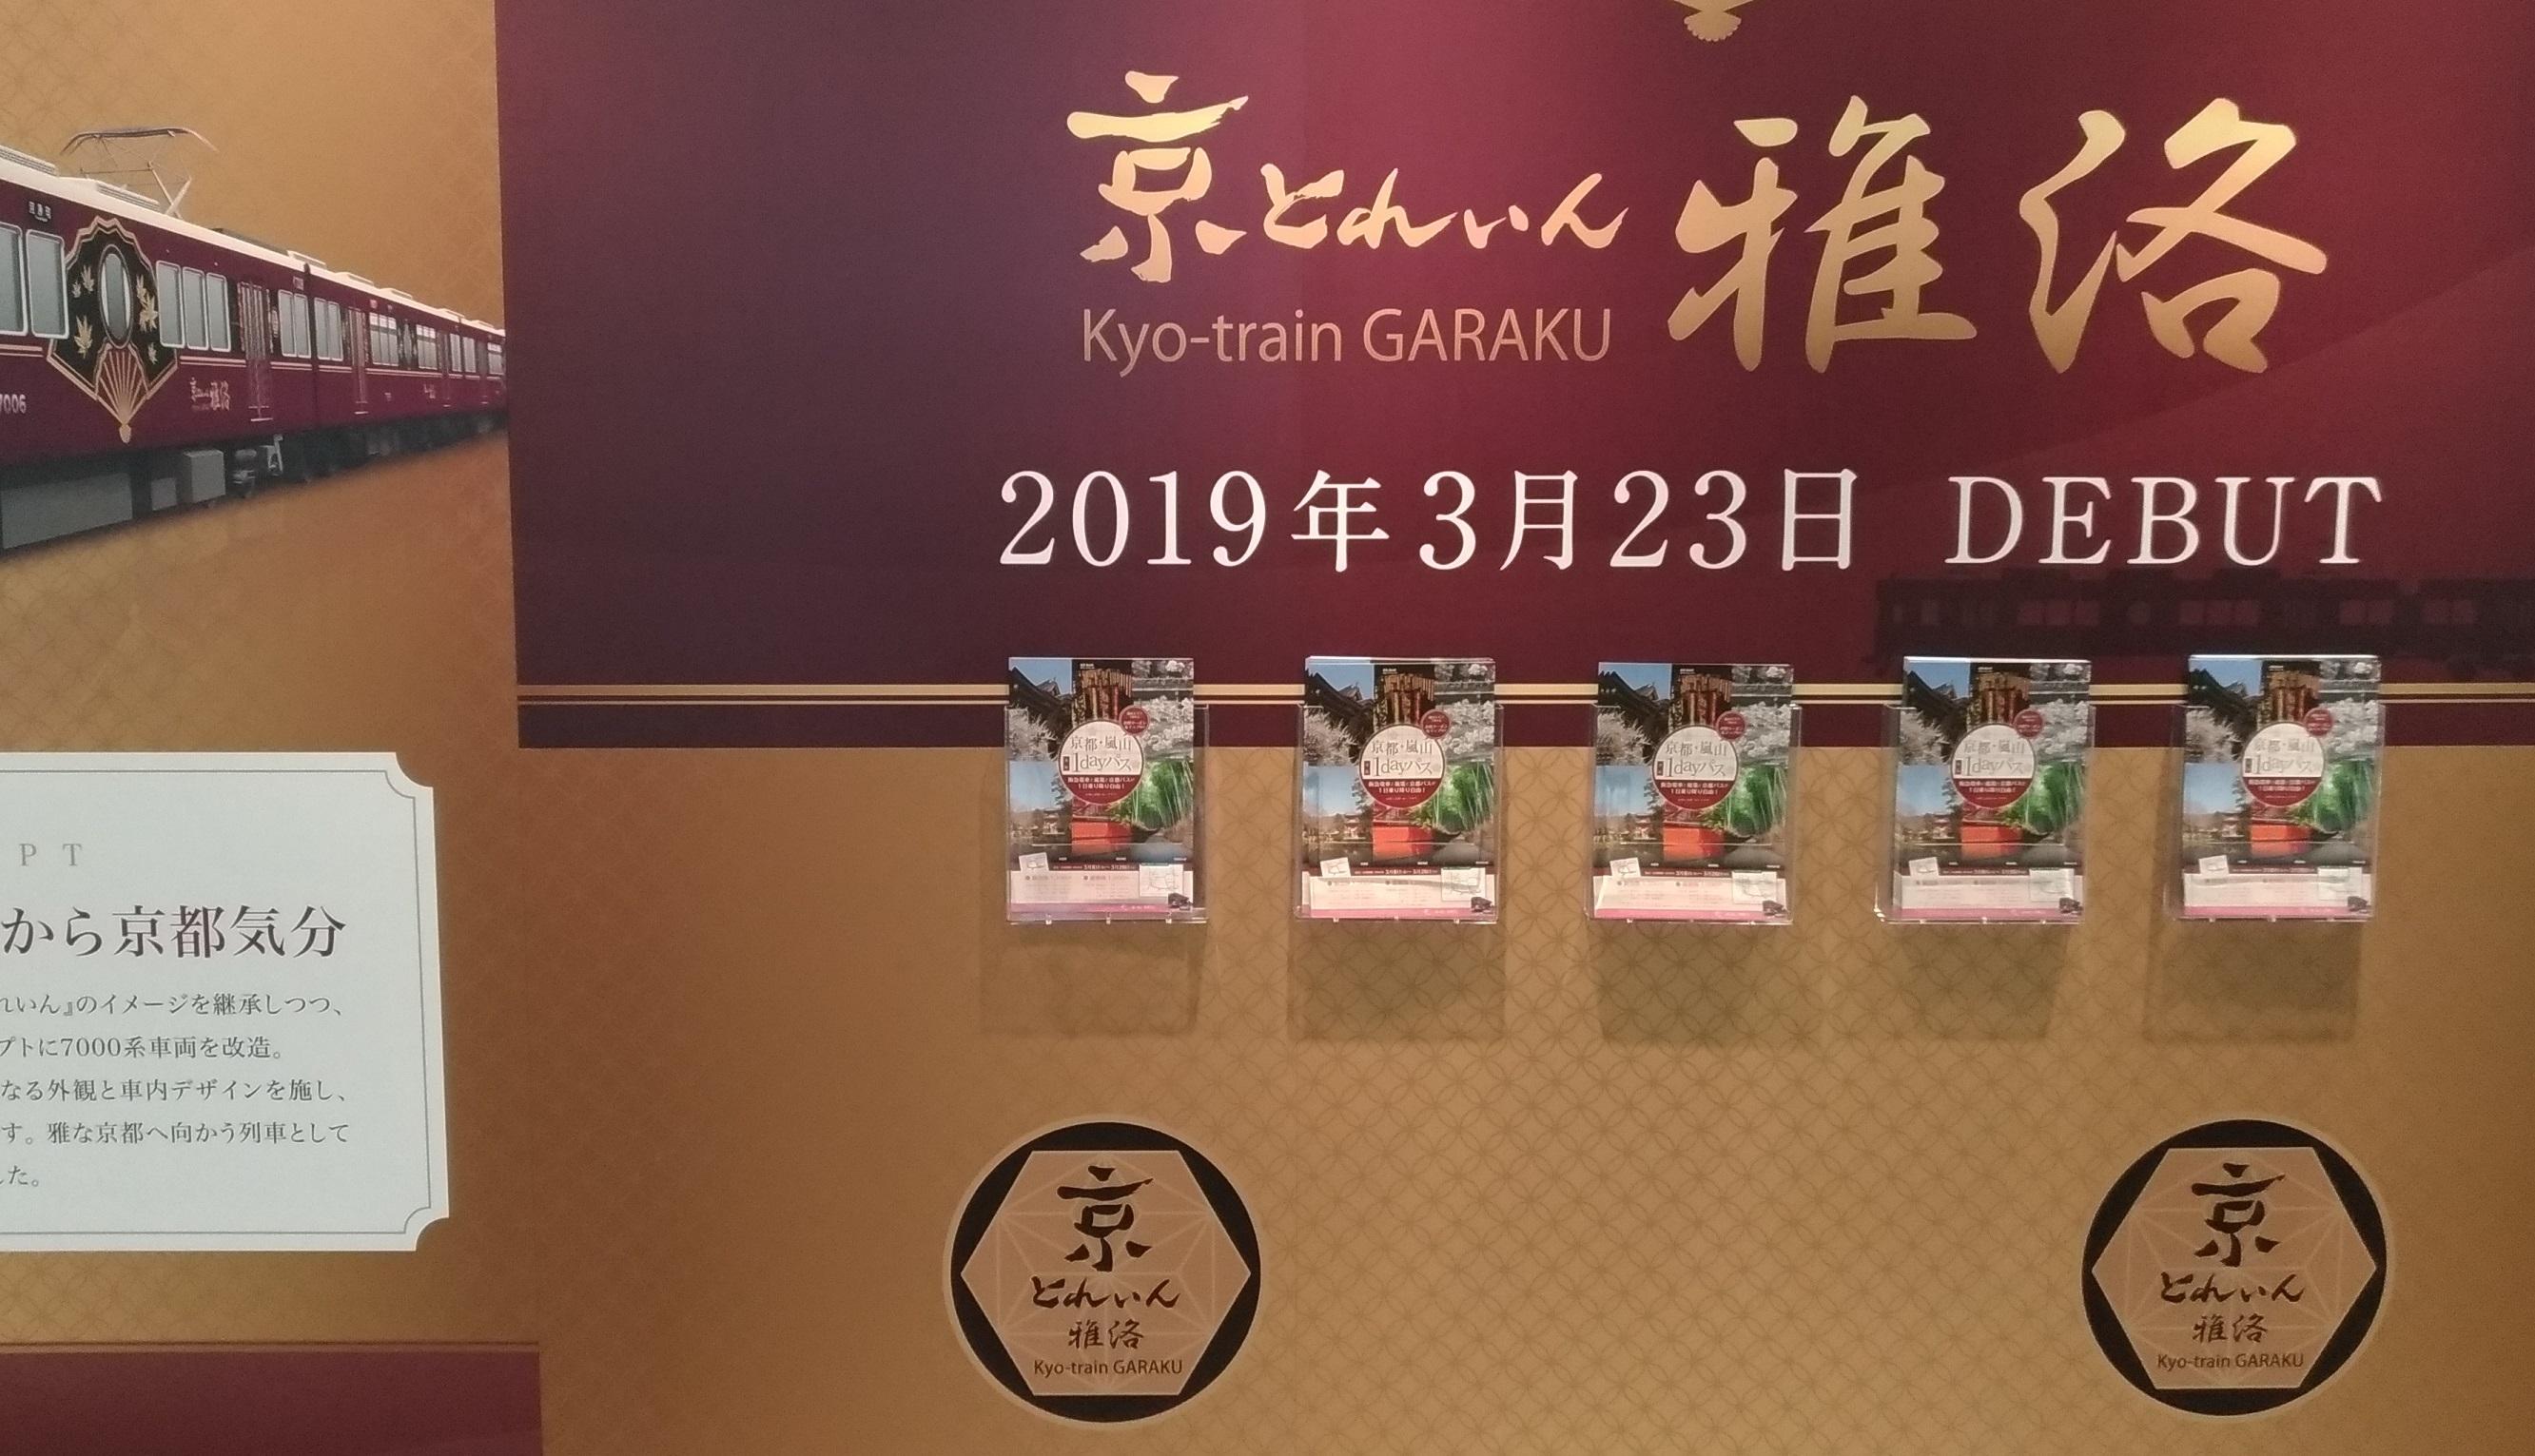 osaka_hankyu_train_kyo_garaku_.jpg